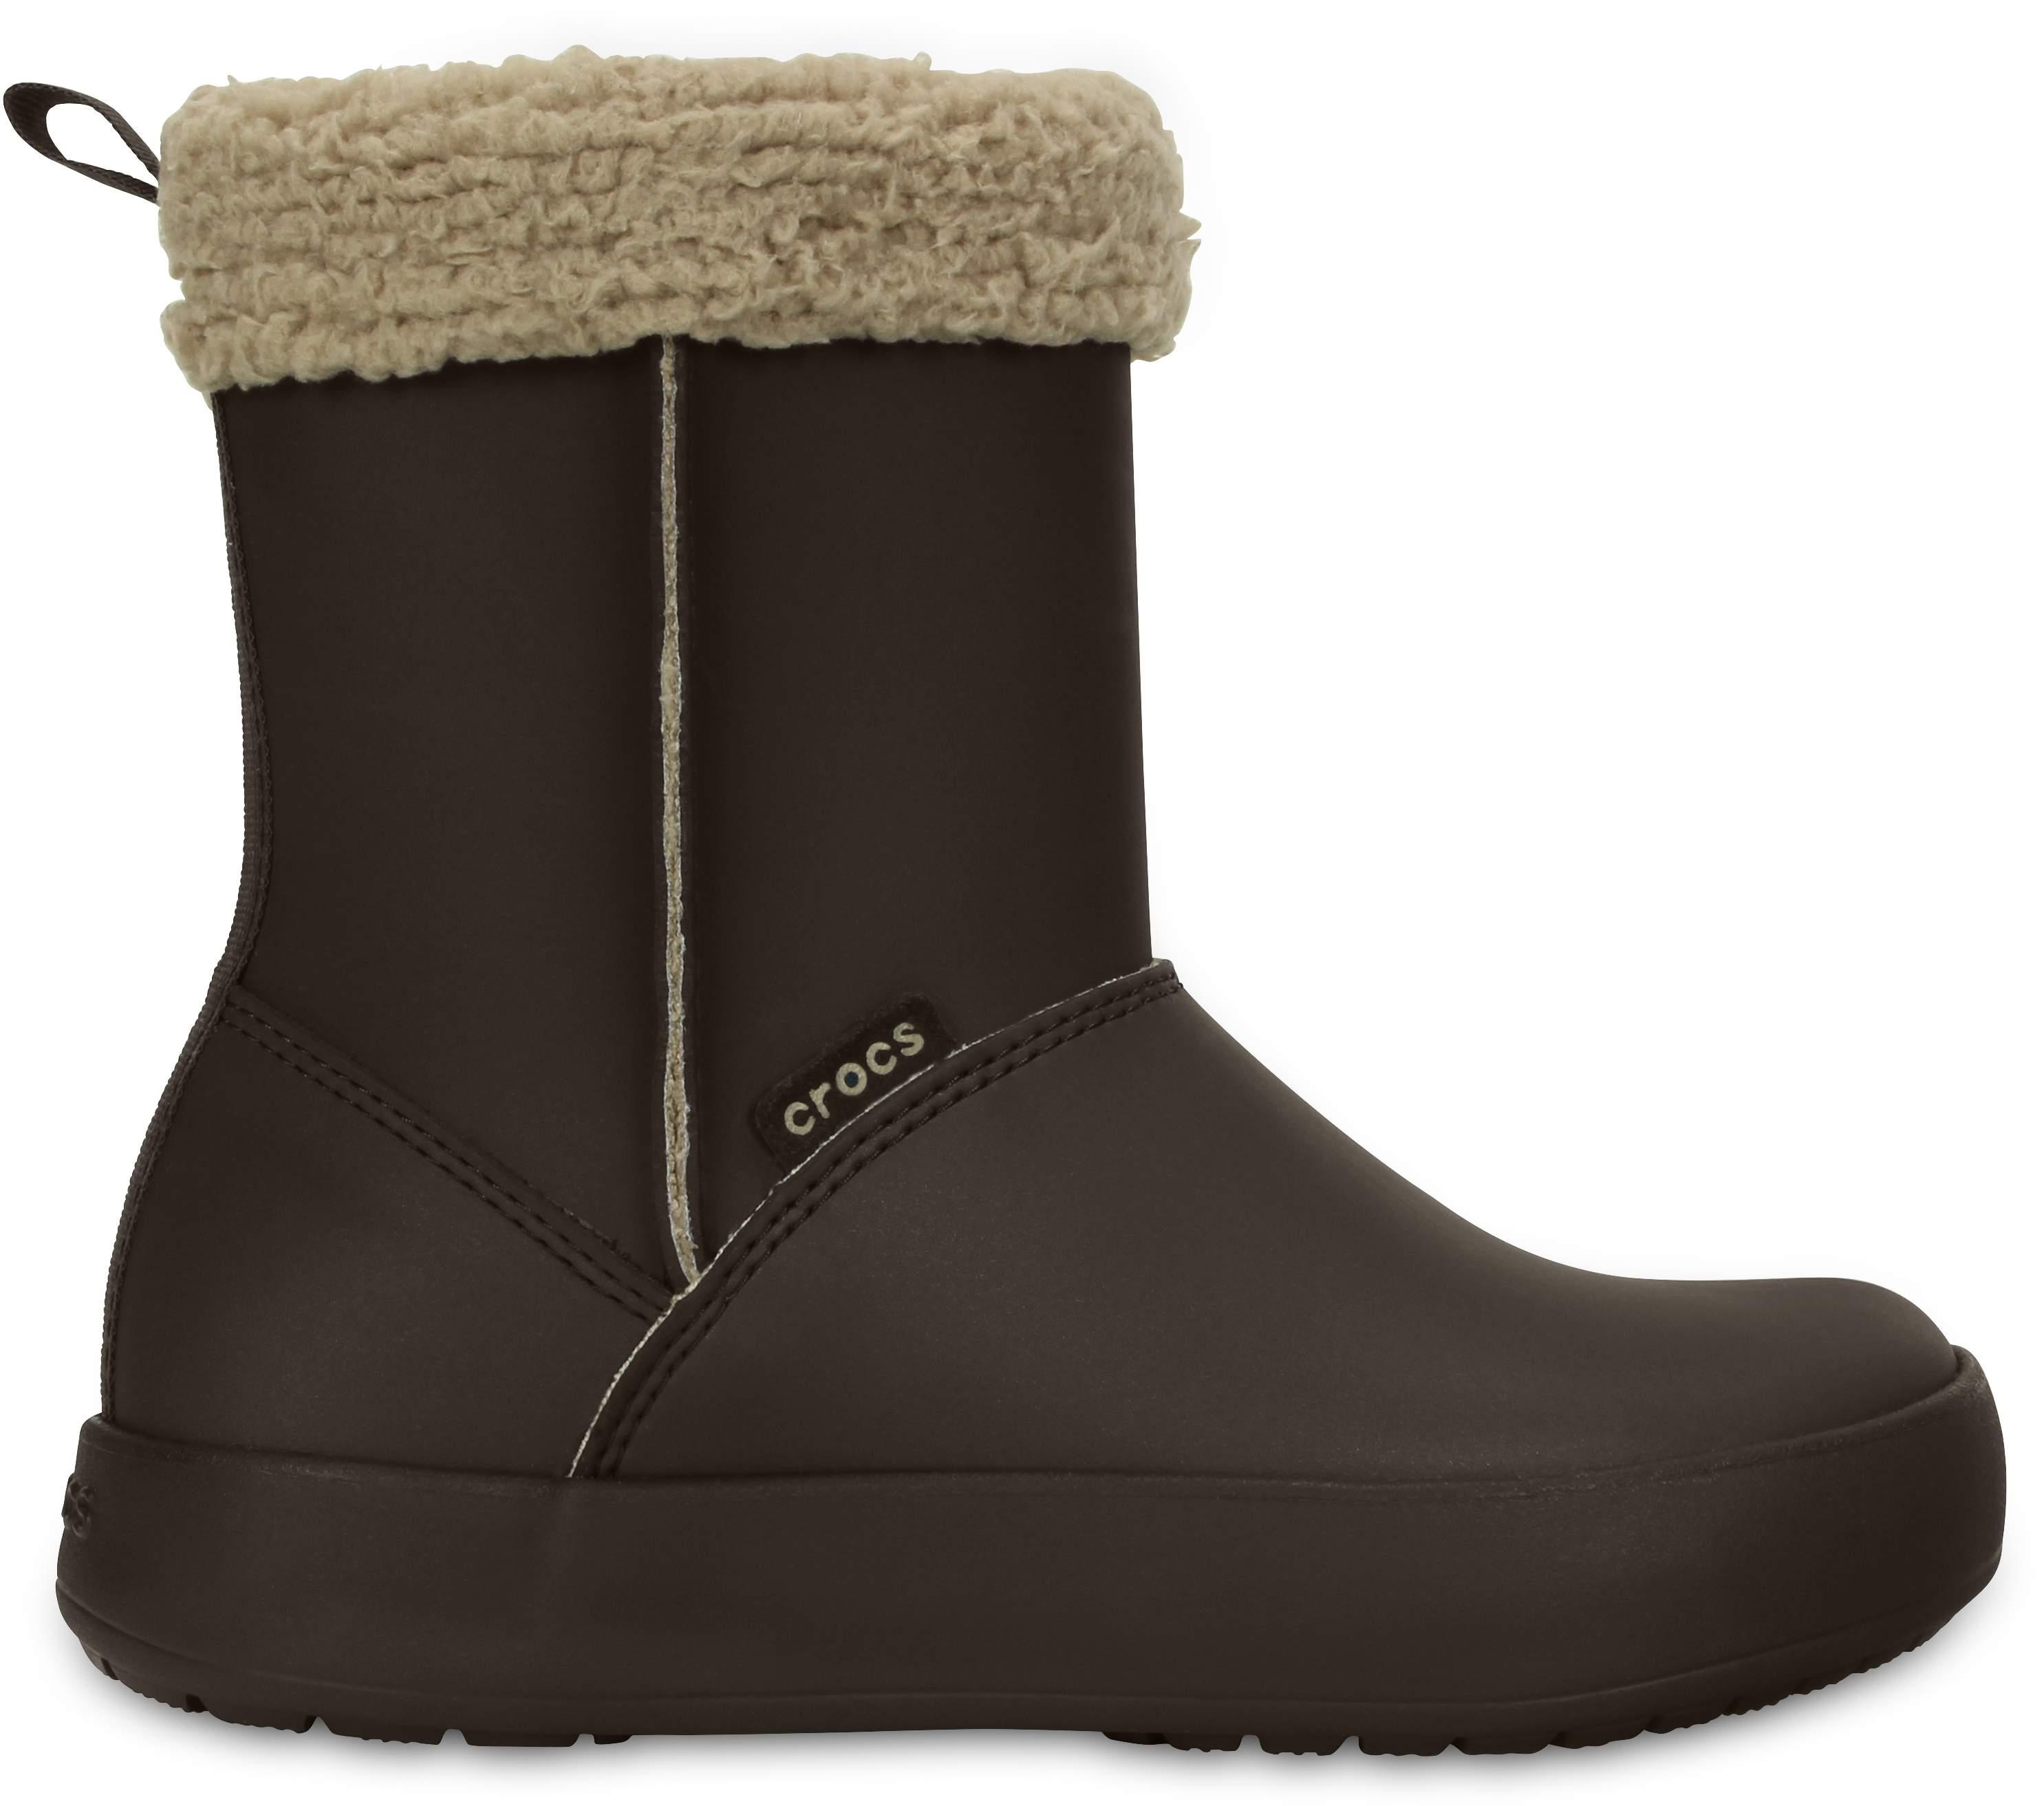 Kids'Crocs ColorLite™ Boot (juniors')